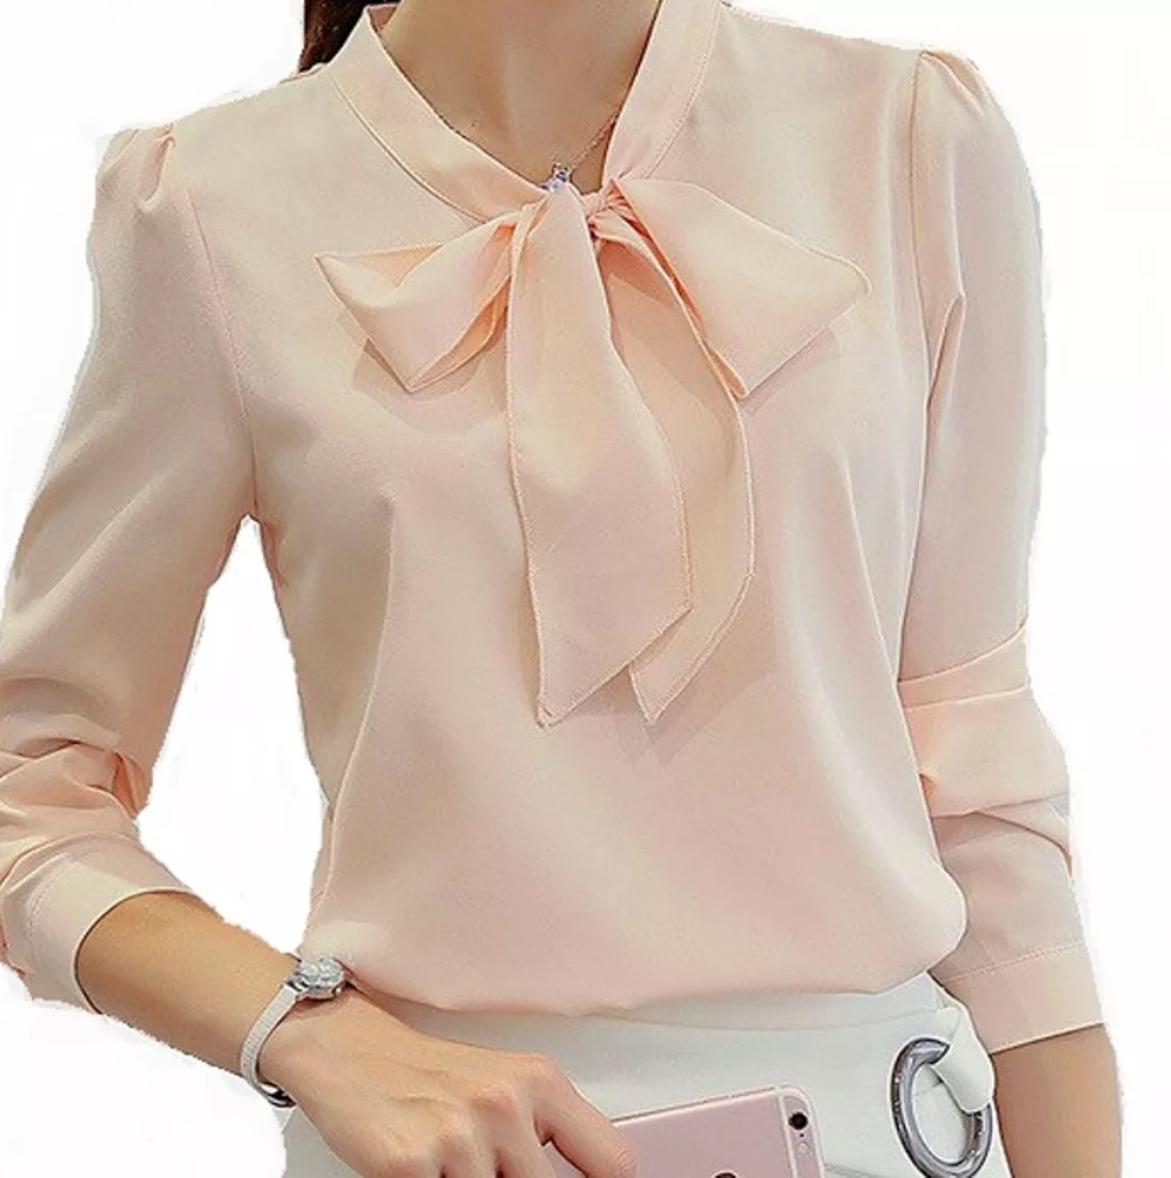 174b4760a1 blusa camisa feminina social manga longa tule foto real ggg. Carregando zoom .